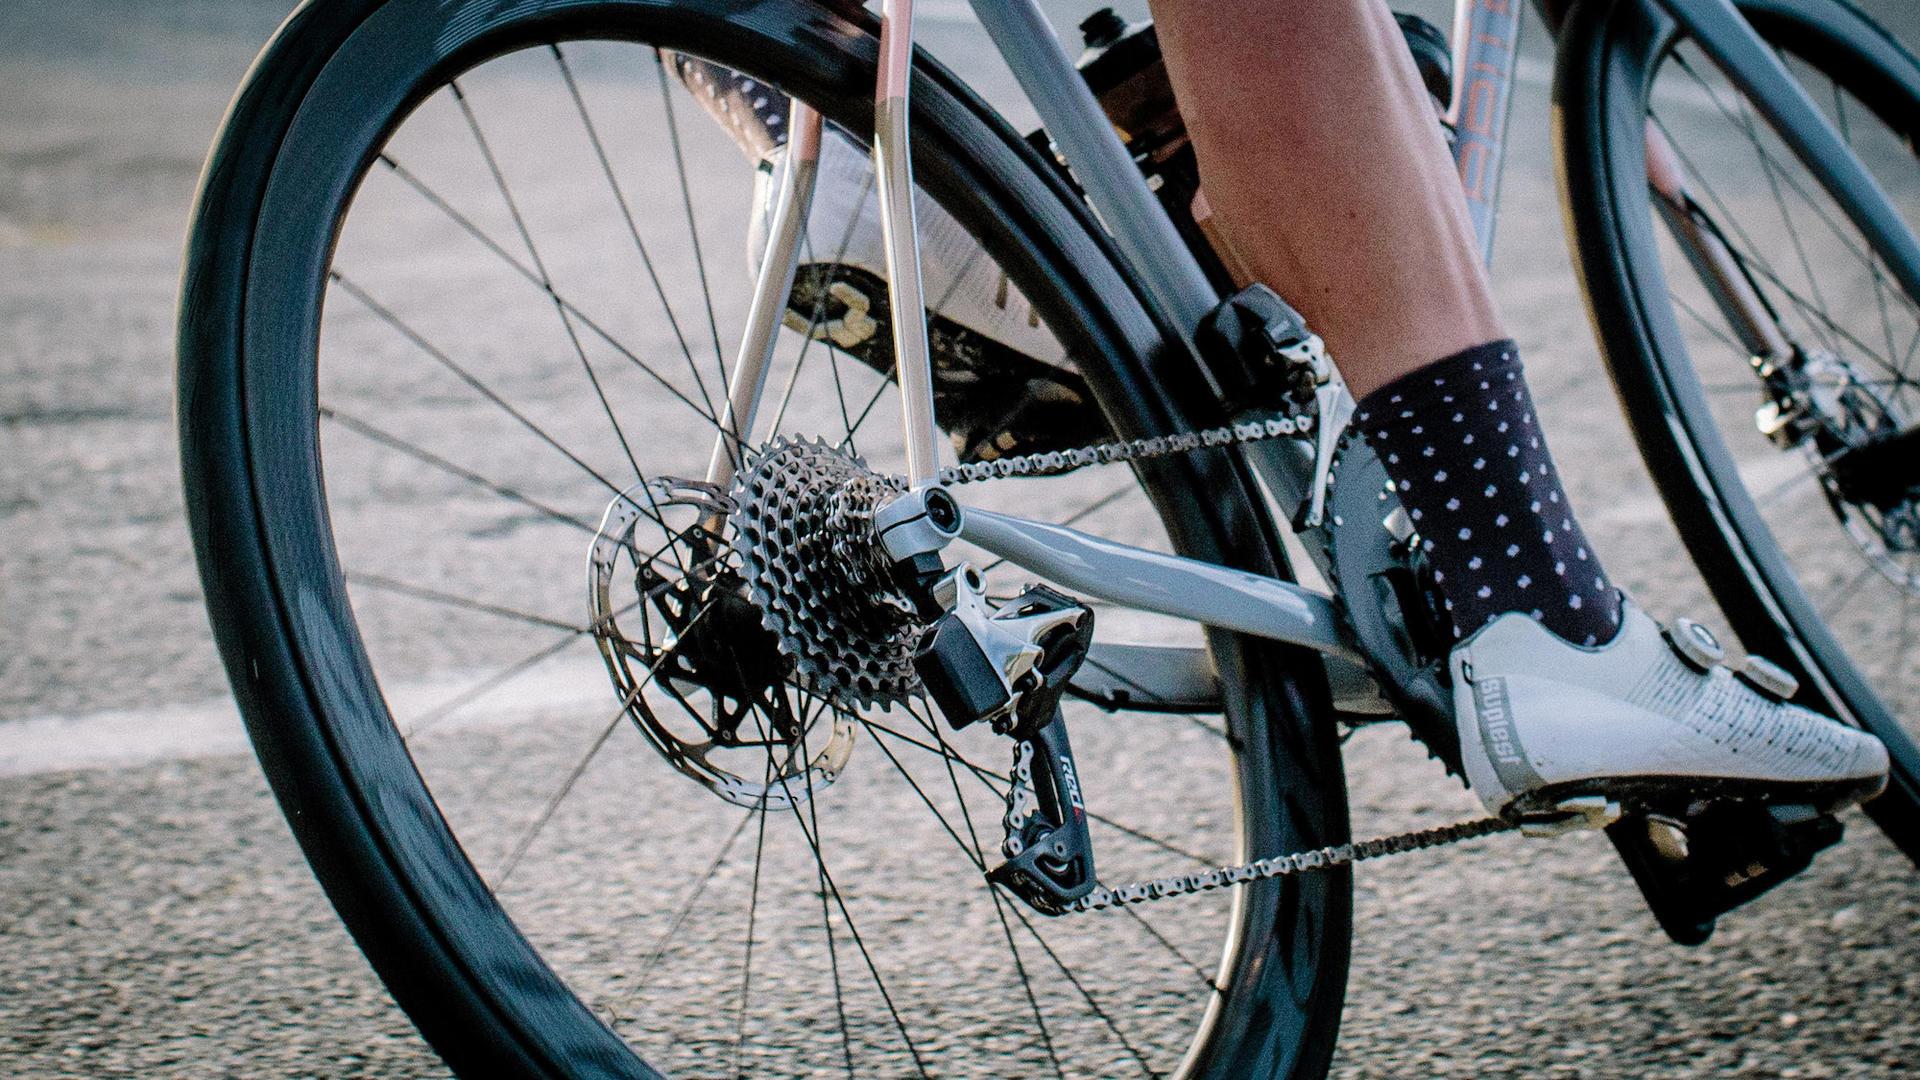 SRAM disc brakes